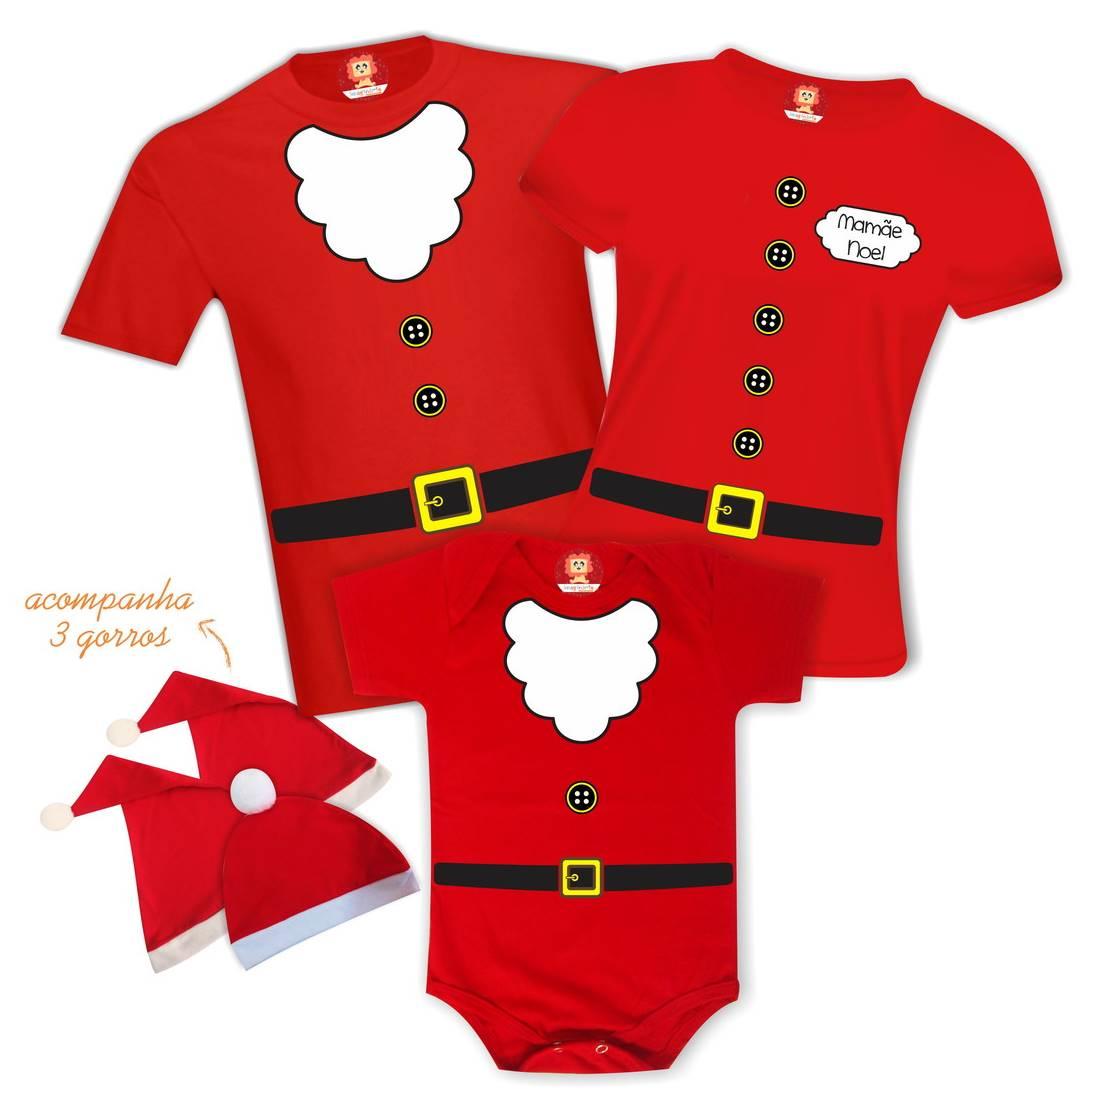 Kit Camisetas Família Noel com Filho Noel